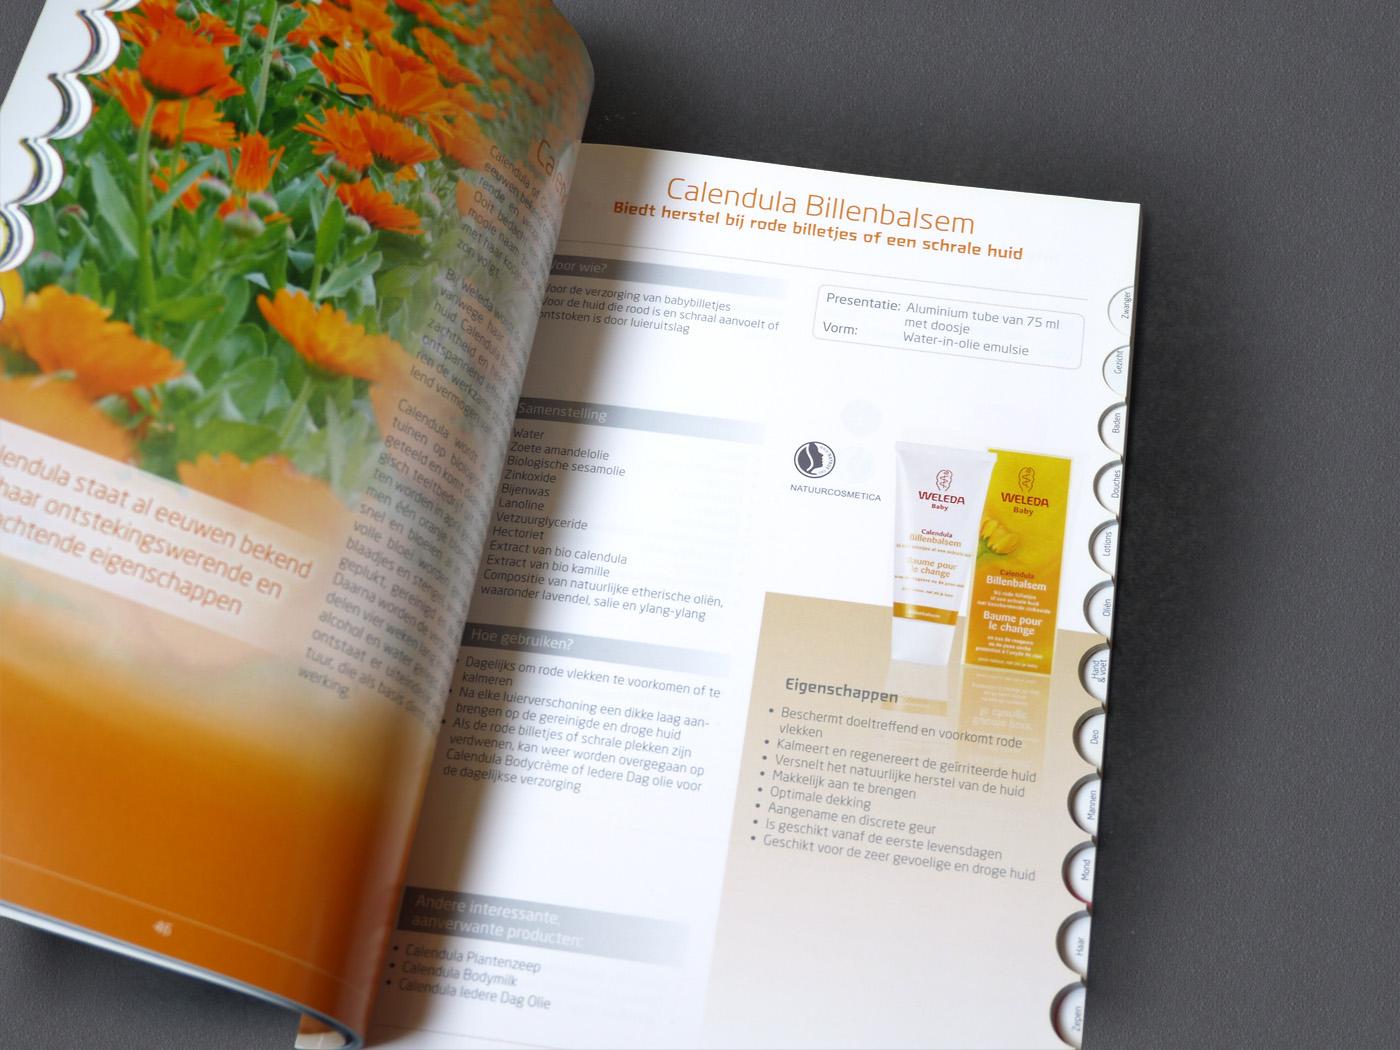 Guide book brochure